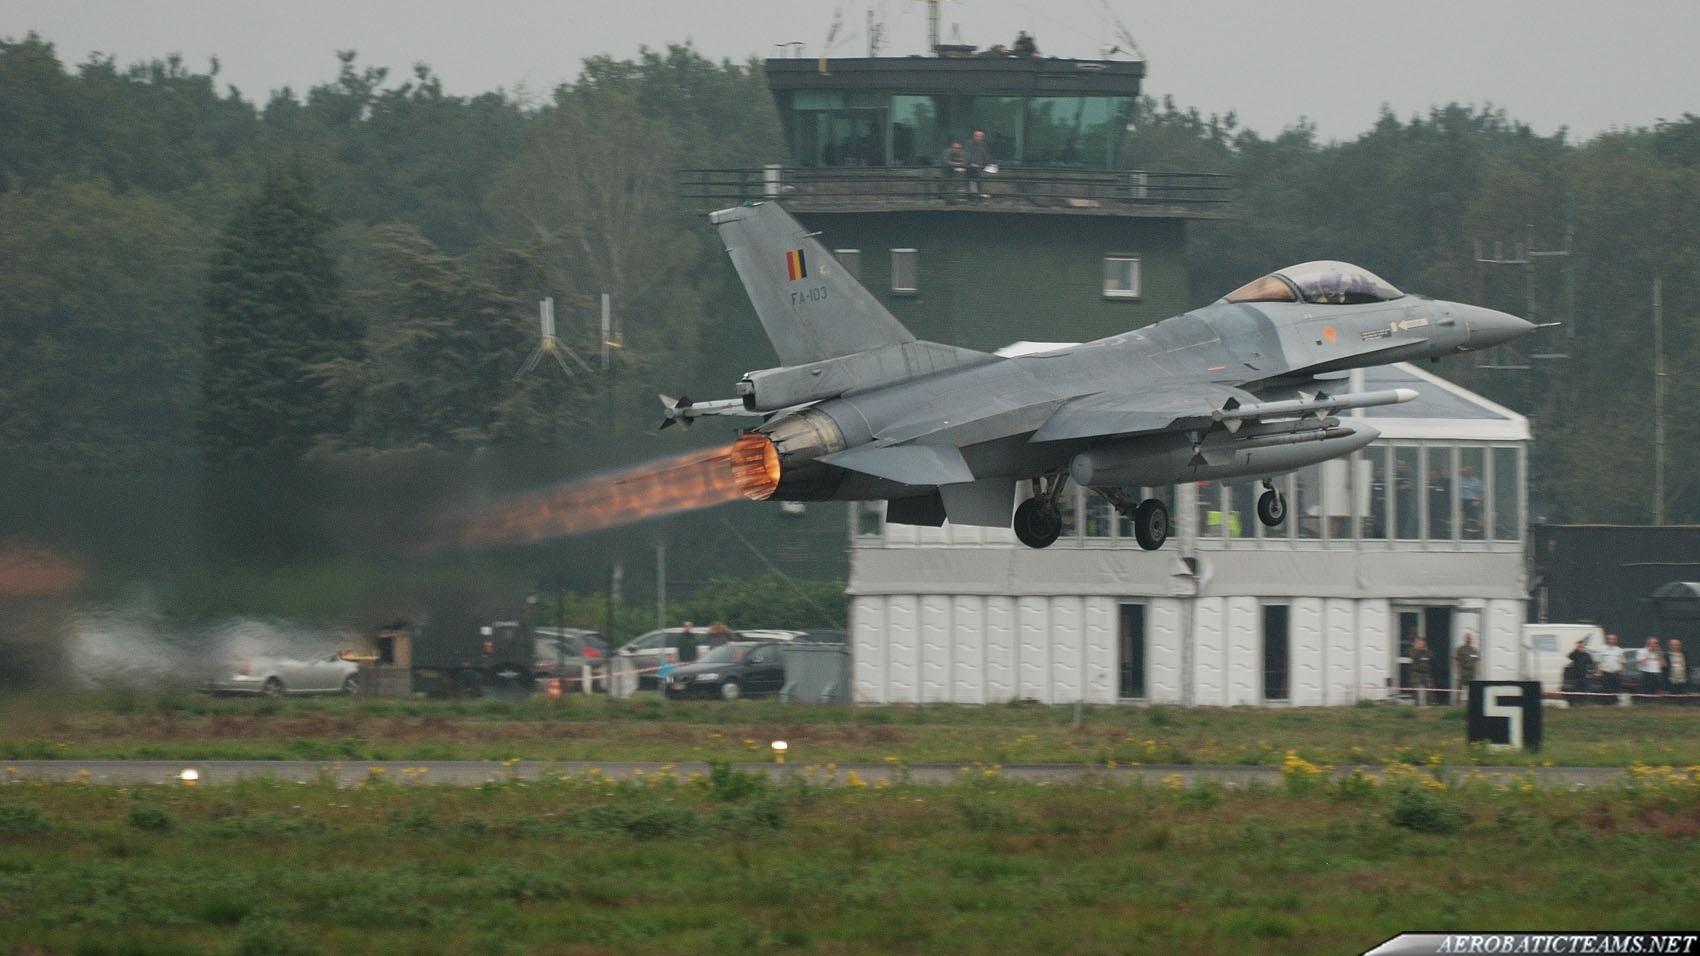 Belgian Air Force F-16 Power Demo display